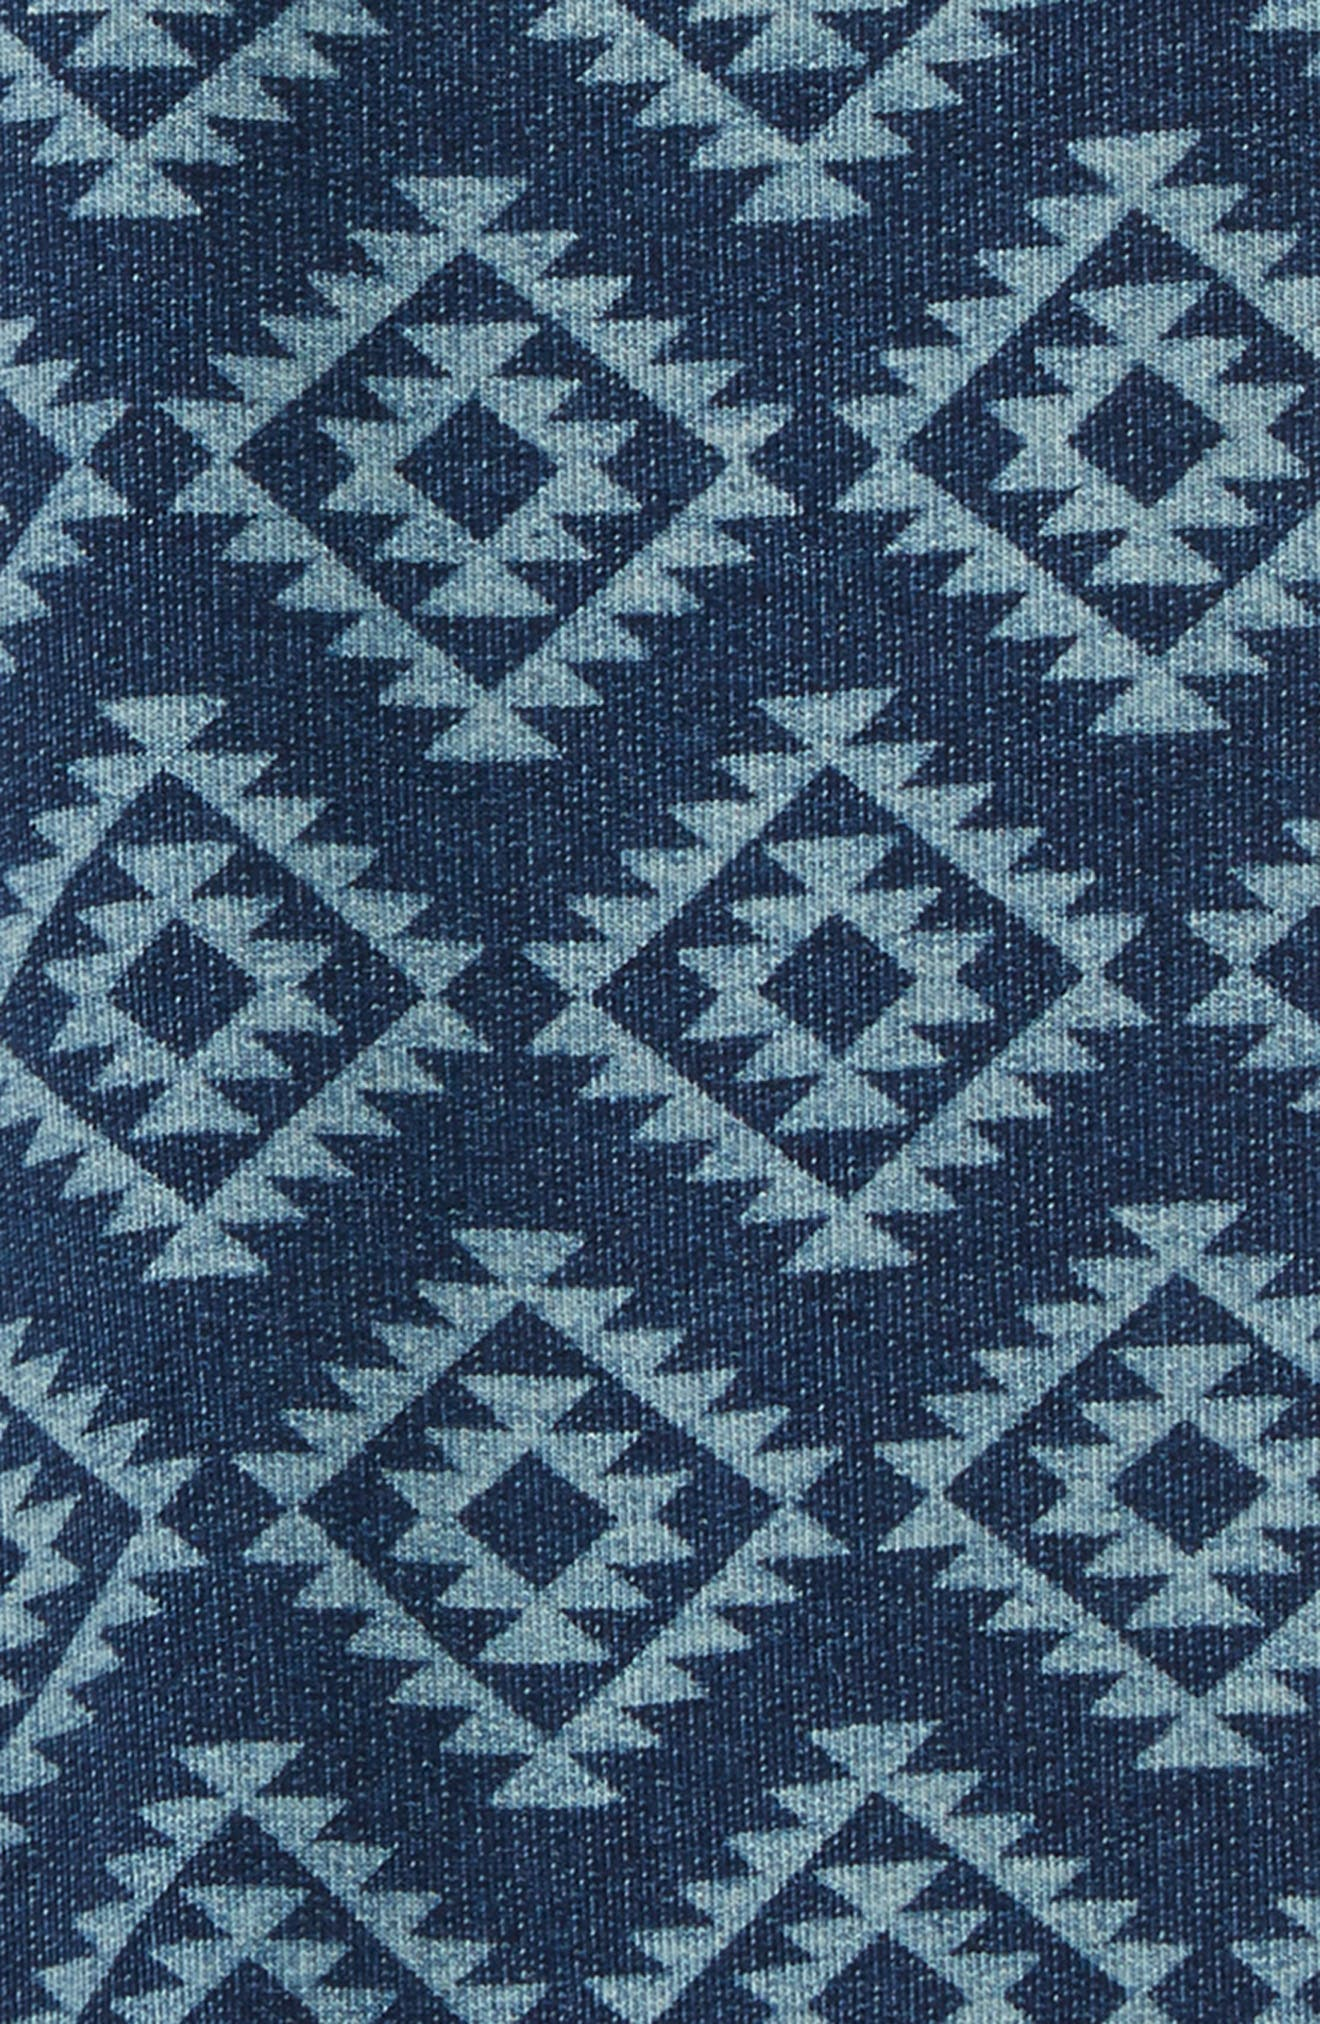 Brody Print Knit Shorts,                             Alternate thumbnail 2, color,                             410